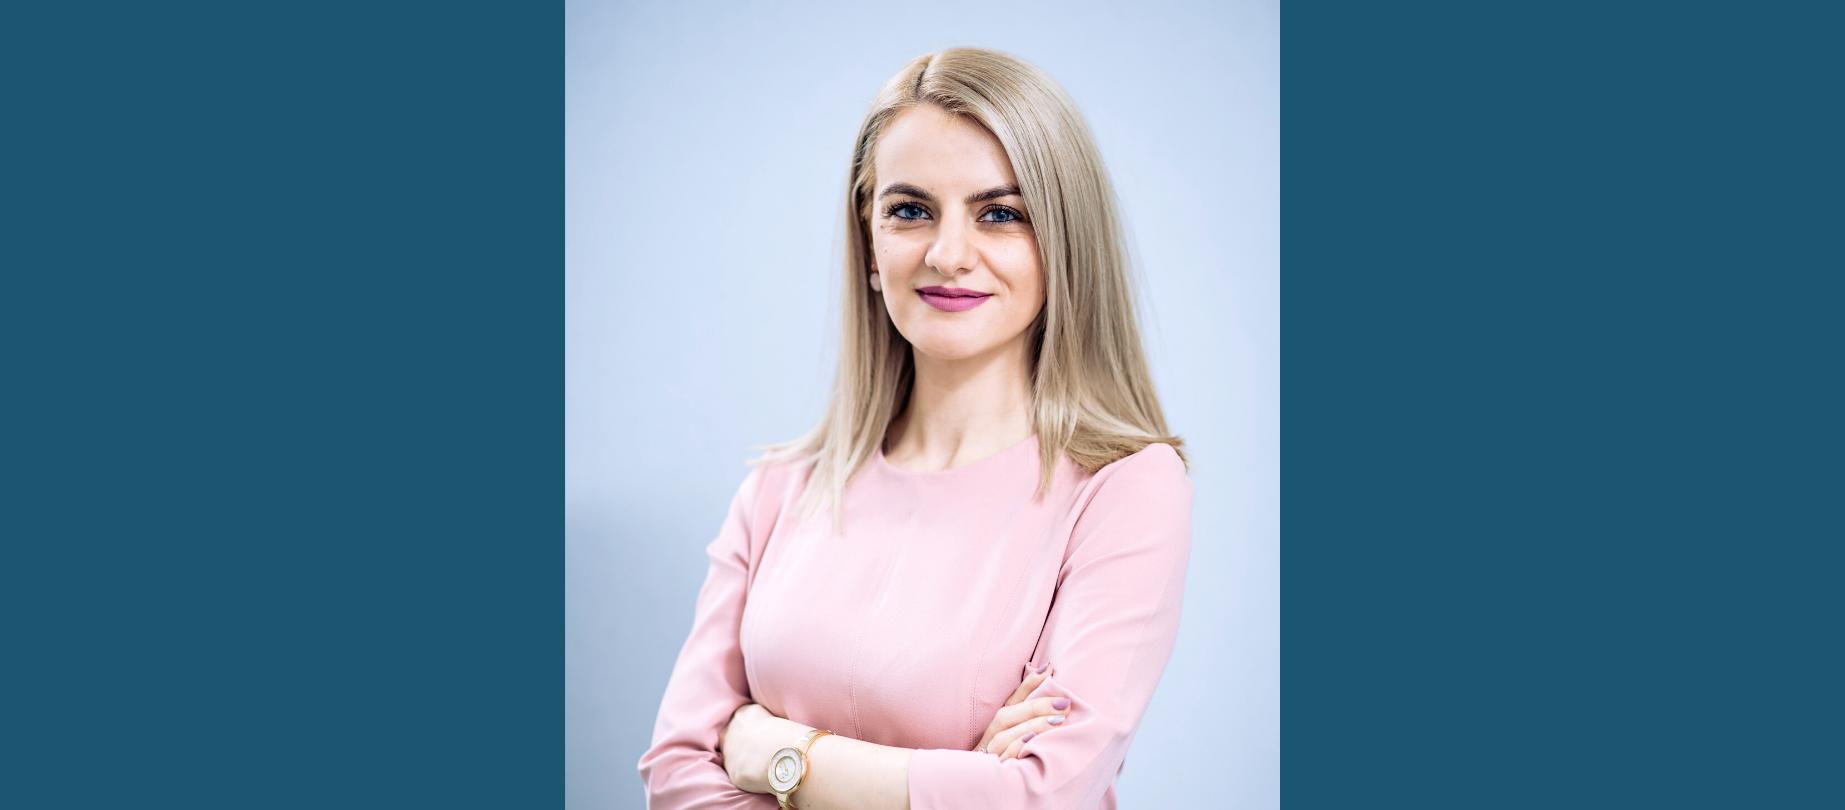 Andra holhos Director general Rețea Dr. Holhoș